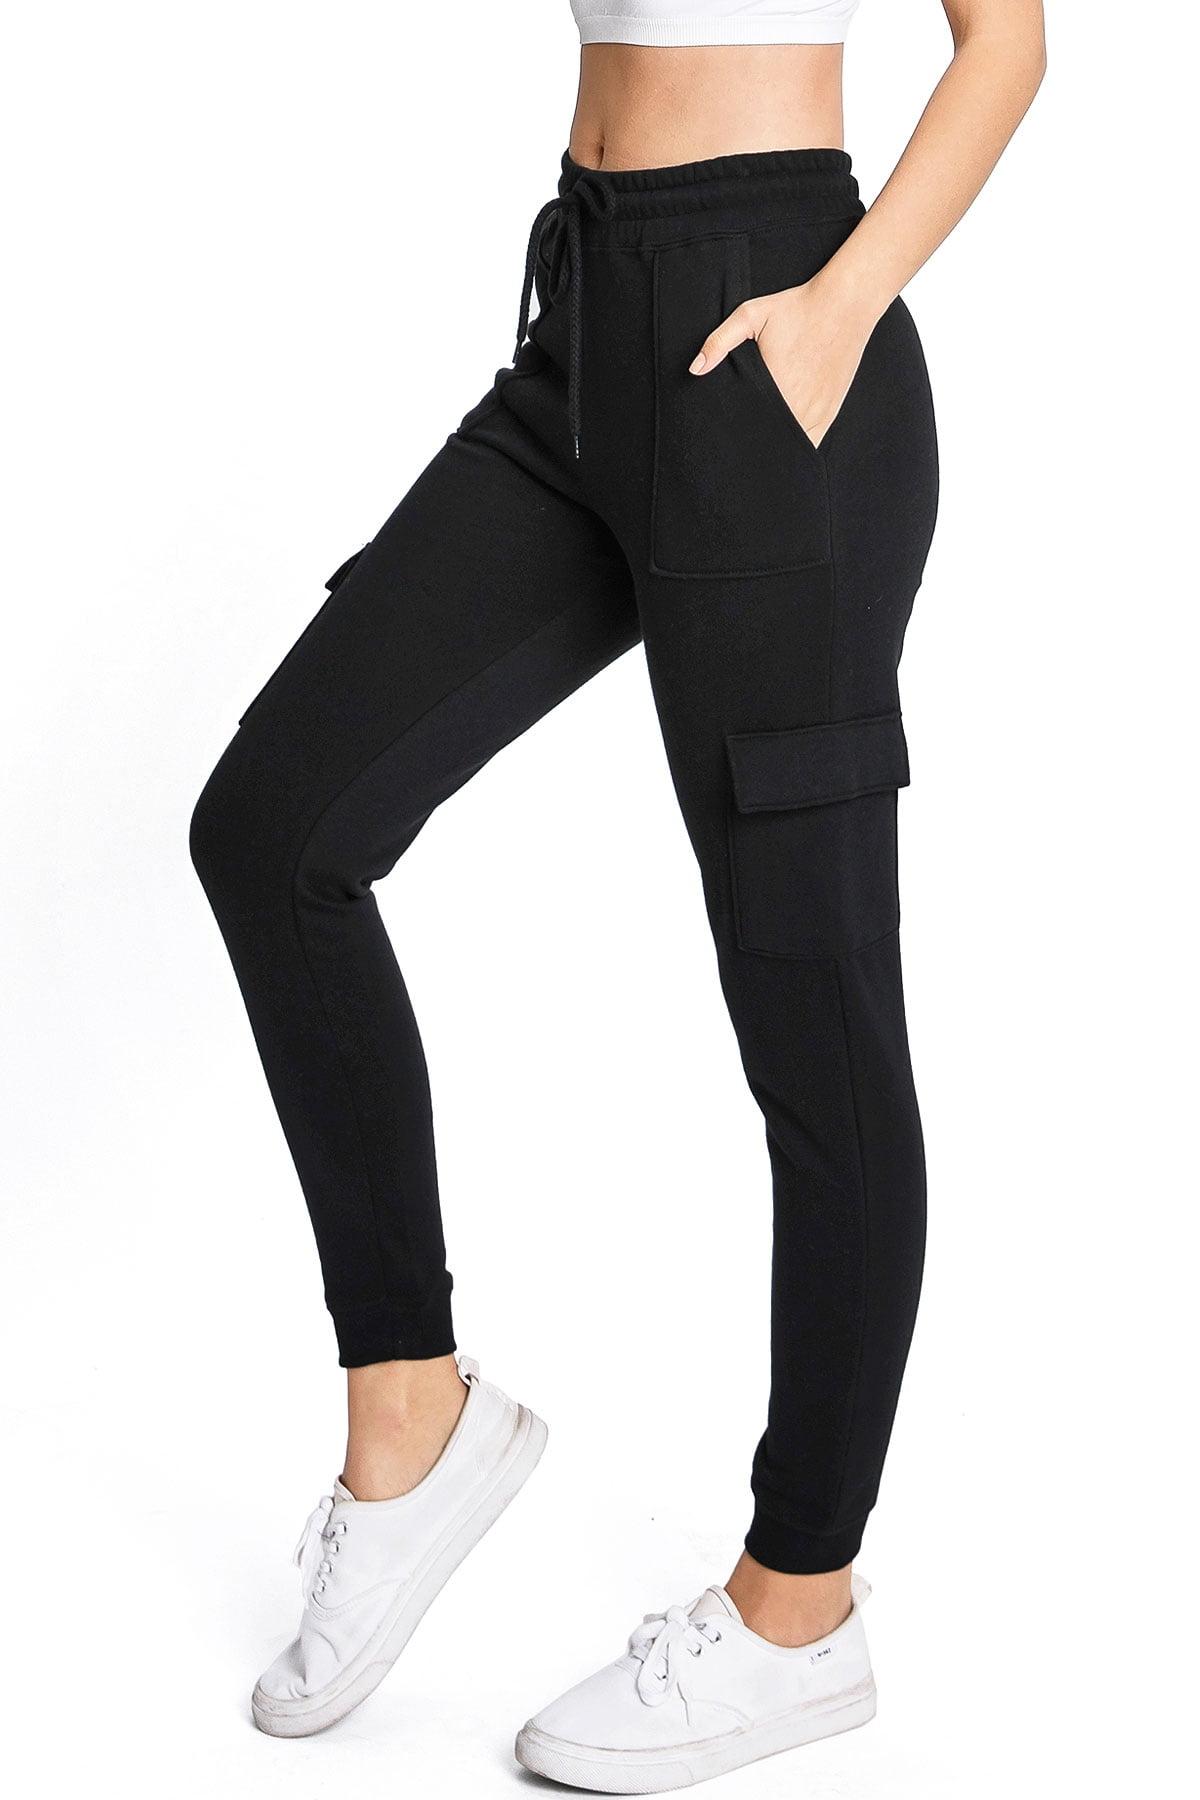 REFLEX Women/'s Junior Soft Gray Jogger Pants Lace up Ankle